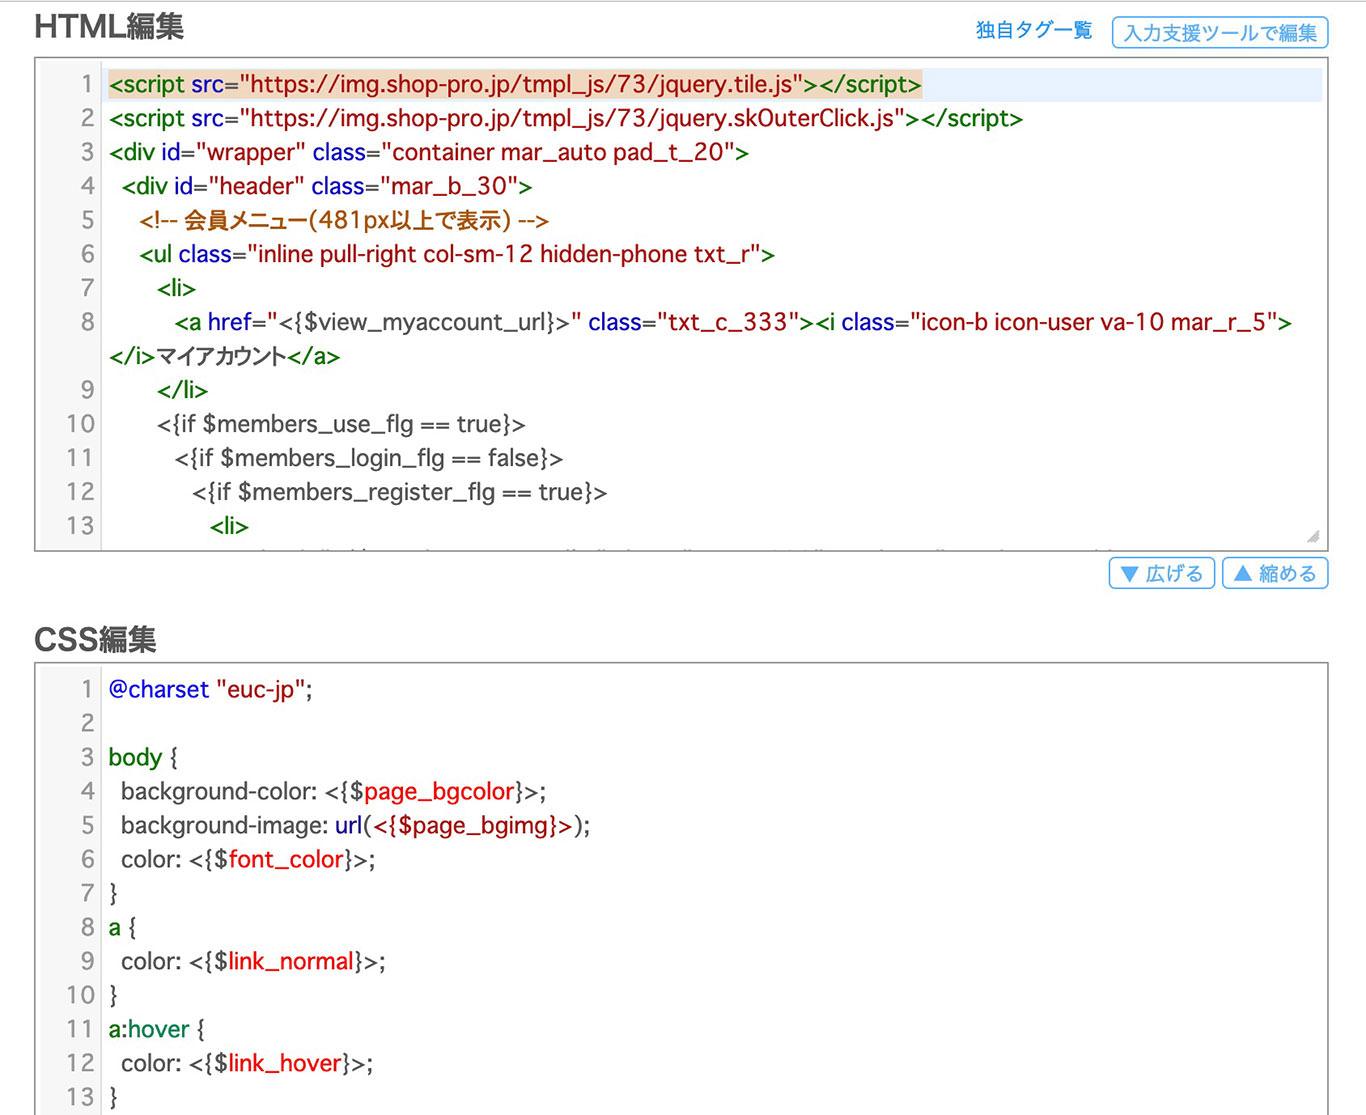 HTMLの編集も可能